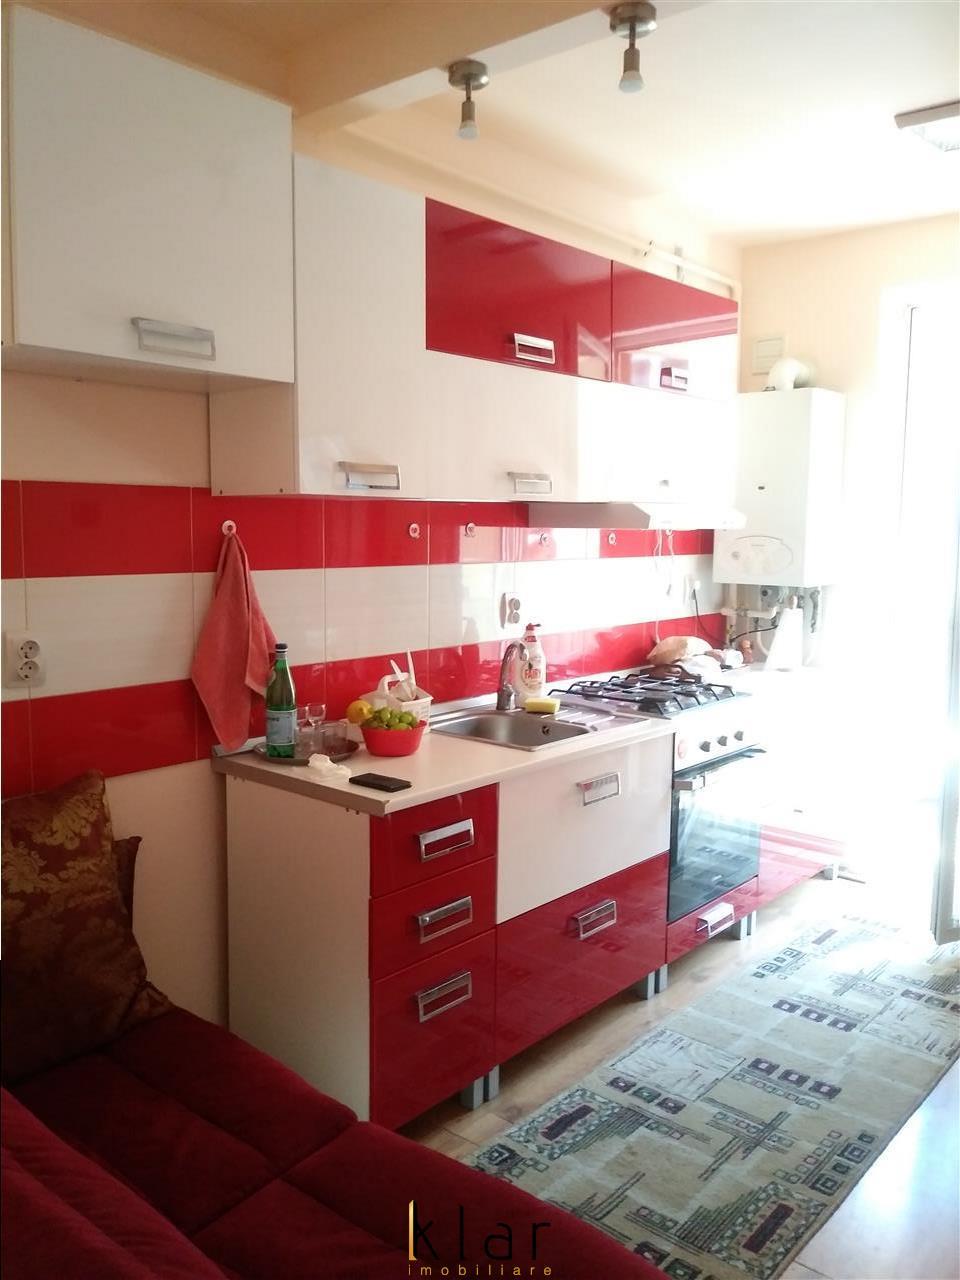 Apartament cu 1 camera, la cheie, zona Porii!